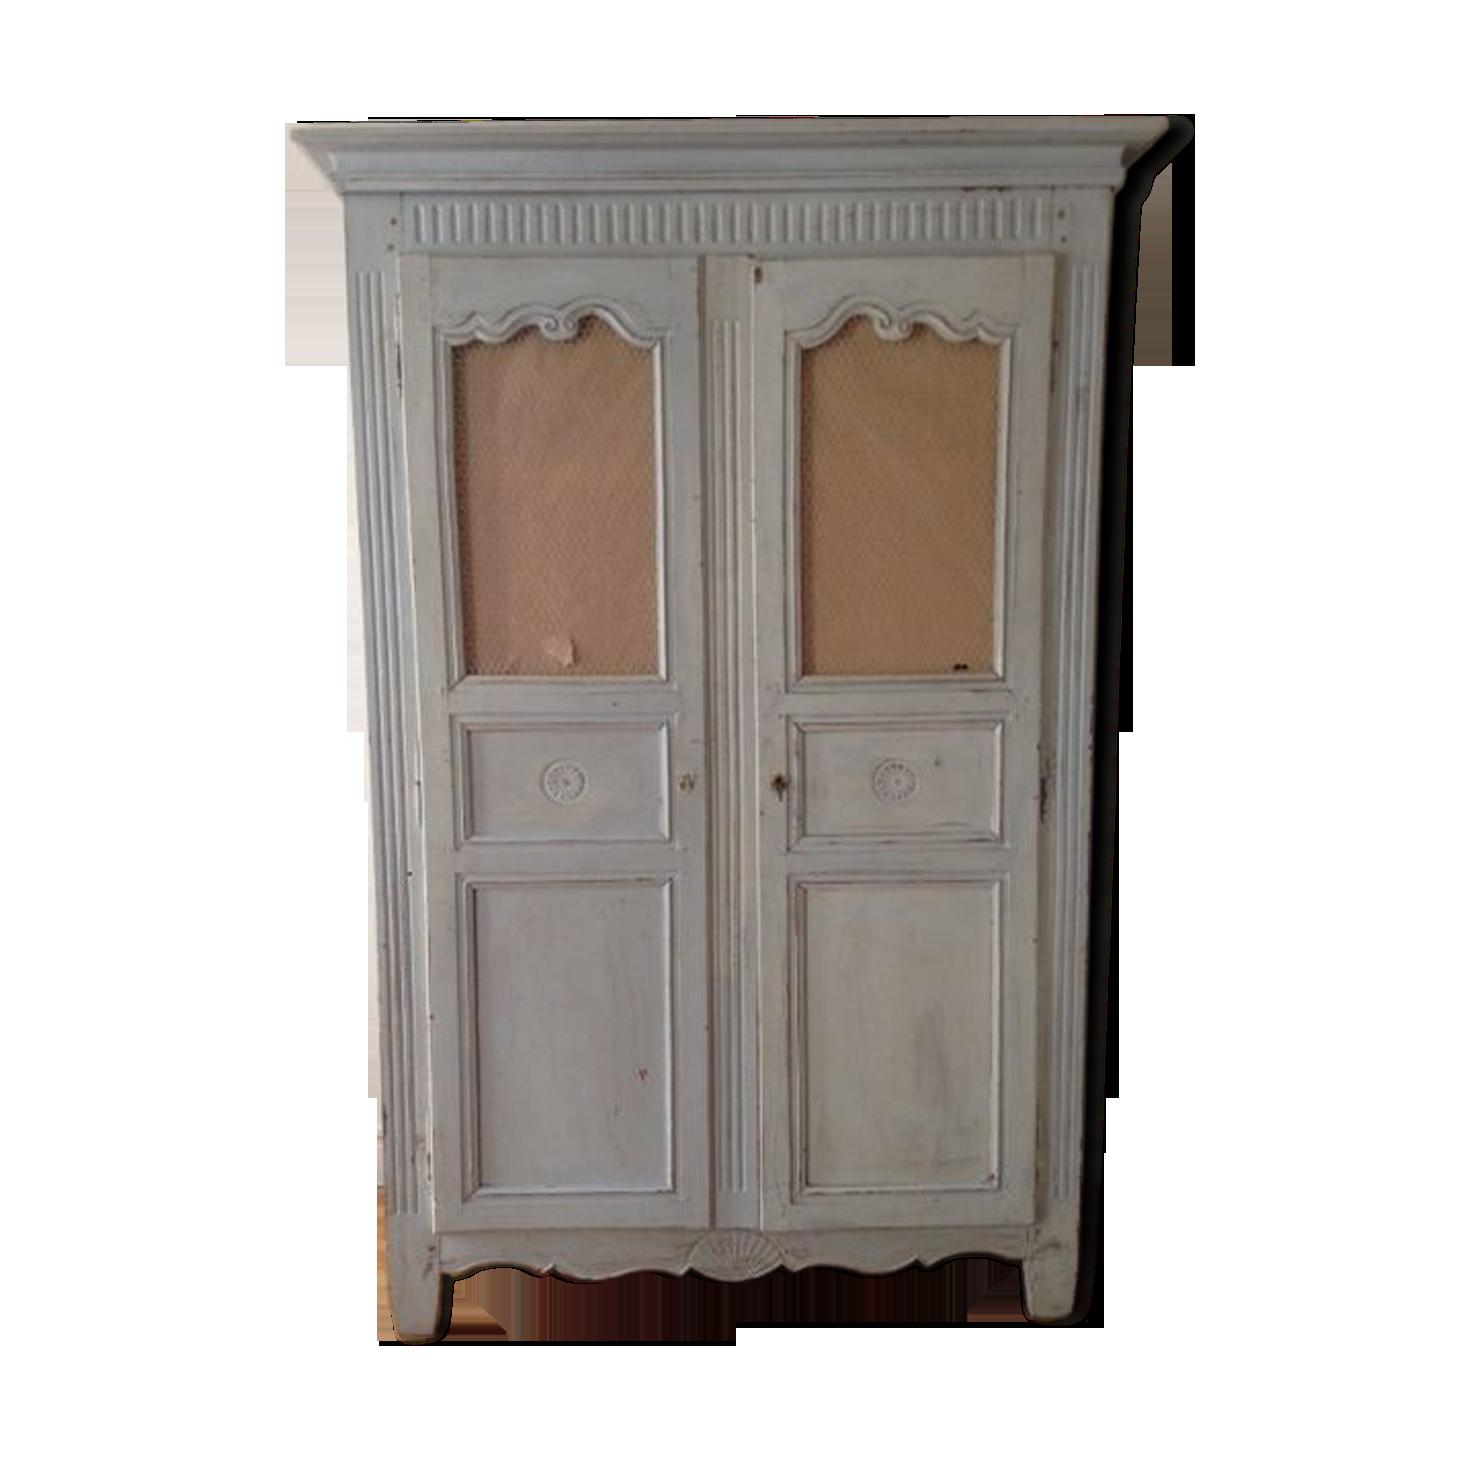 Steens Group 3171120269001F Armoire Monaco Blanc//Gris 145 x 60 x 201 cm